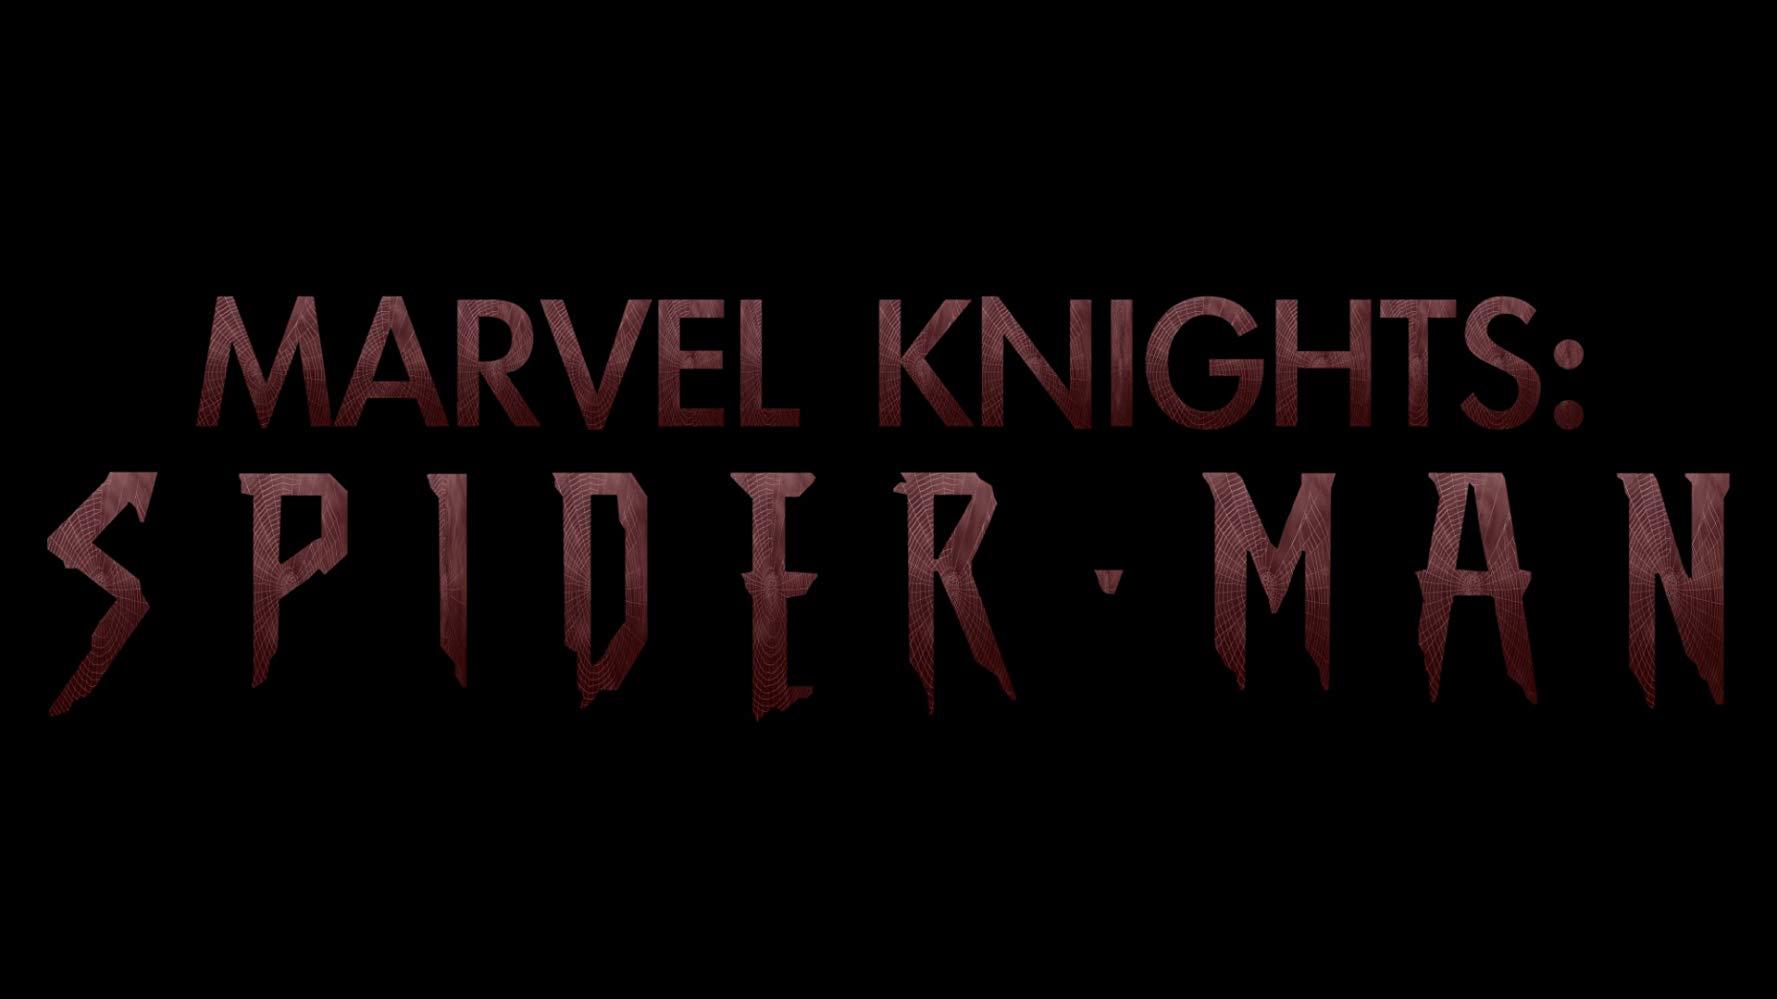 Marvels Spider-Man S02E09 WEB x264-TBS